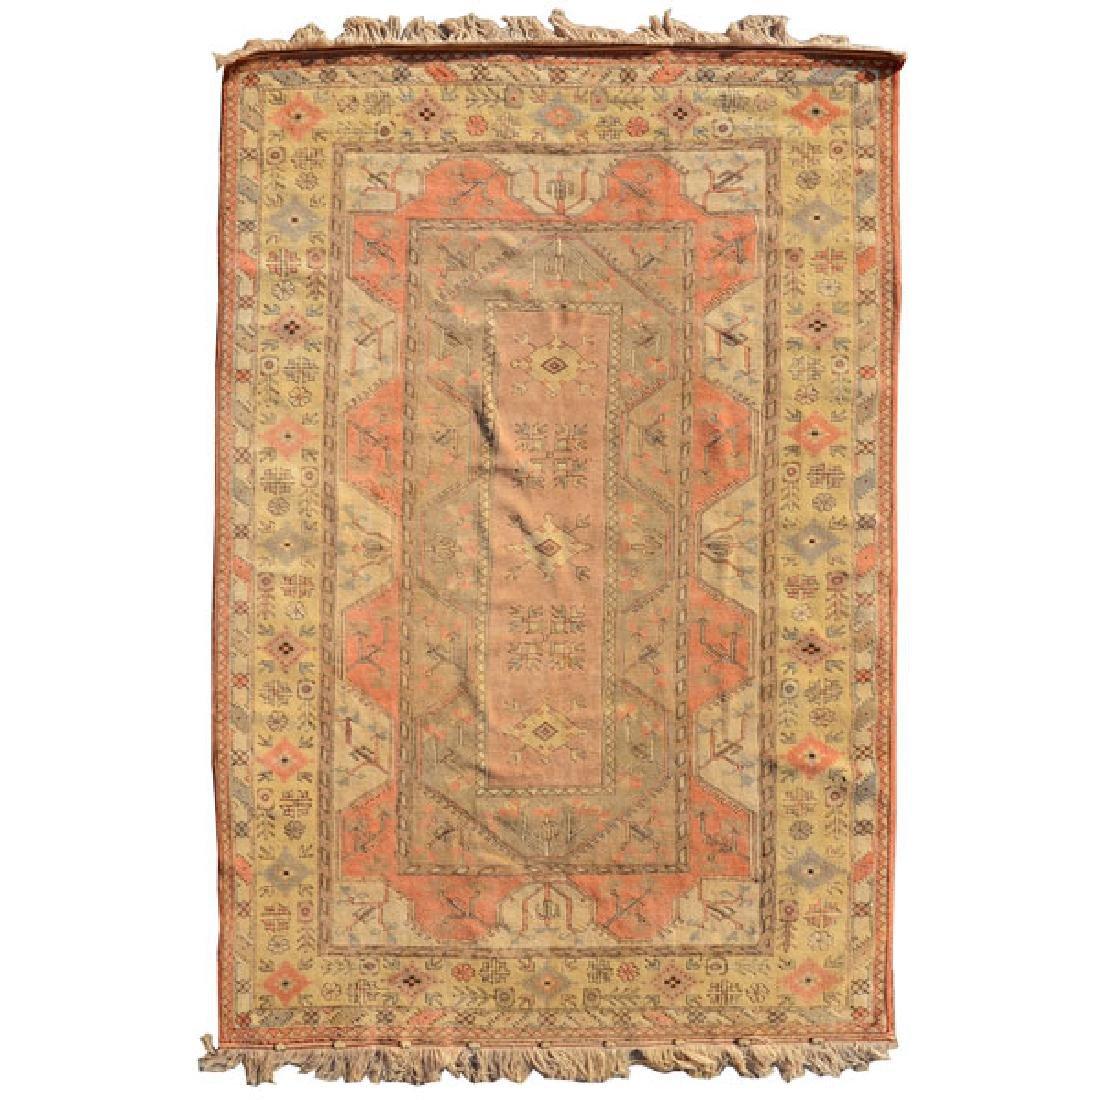 Turkish Wedding Carpet: 8 feet 2 inches x 11 feet 10